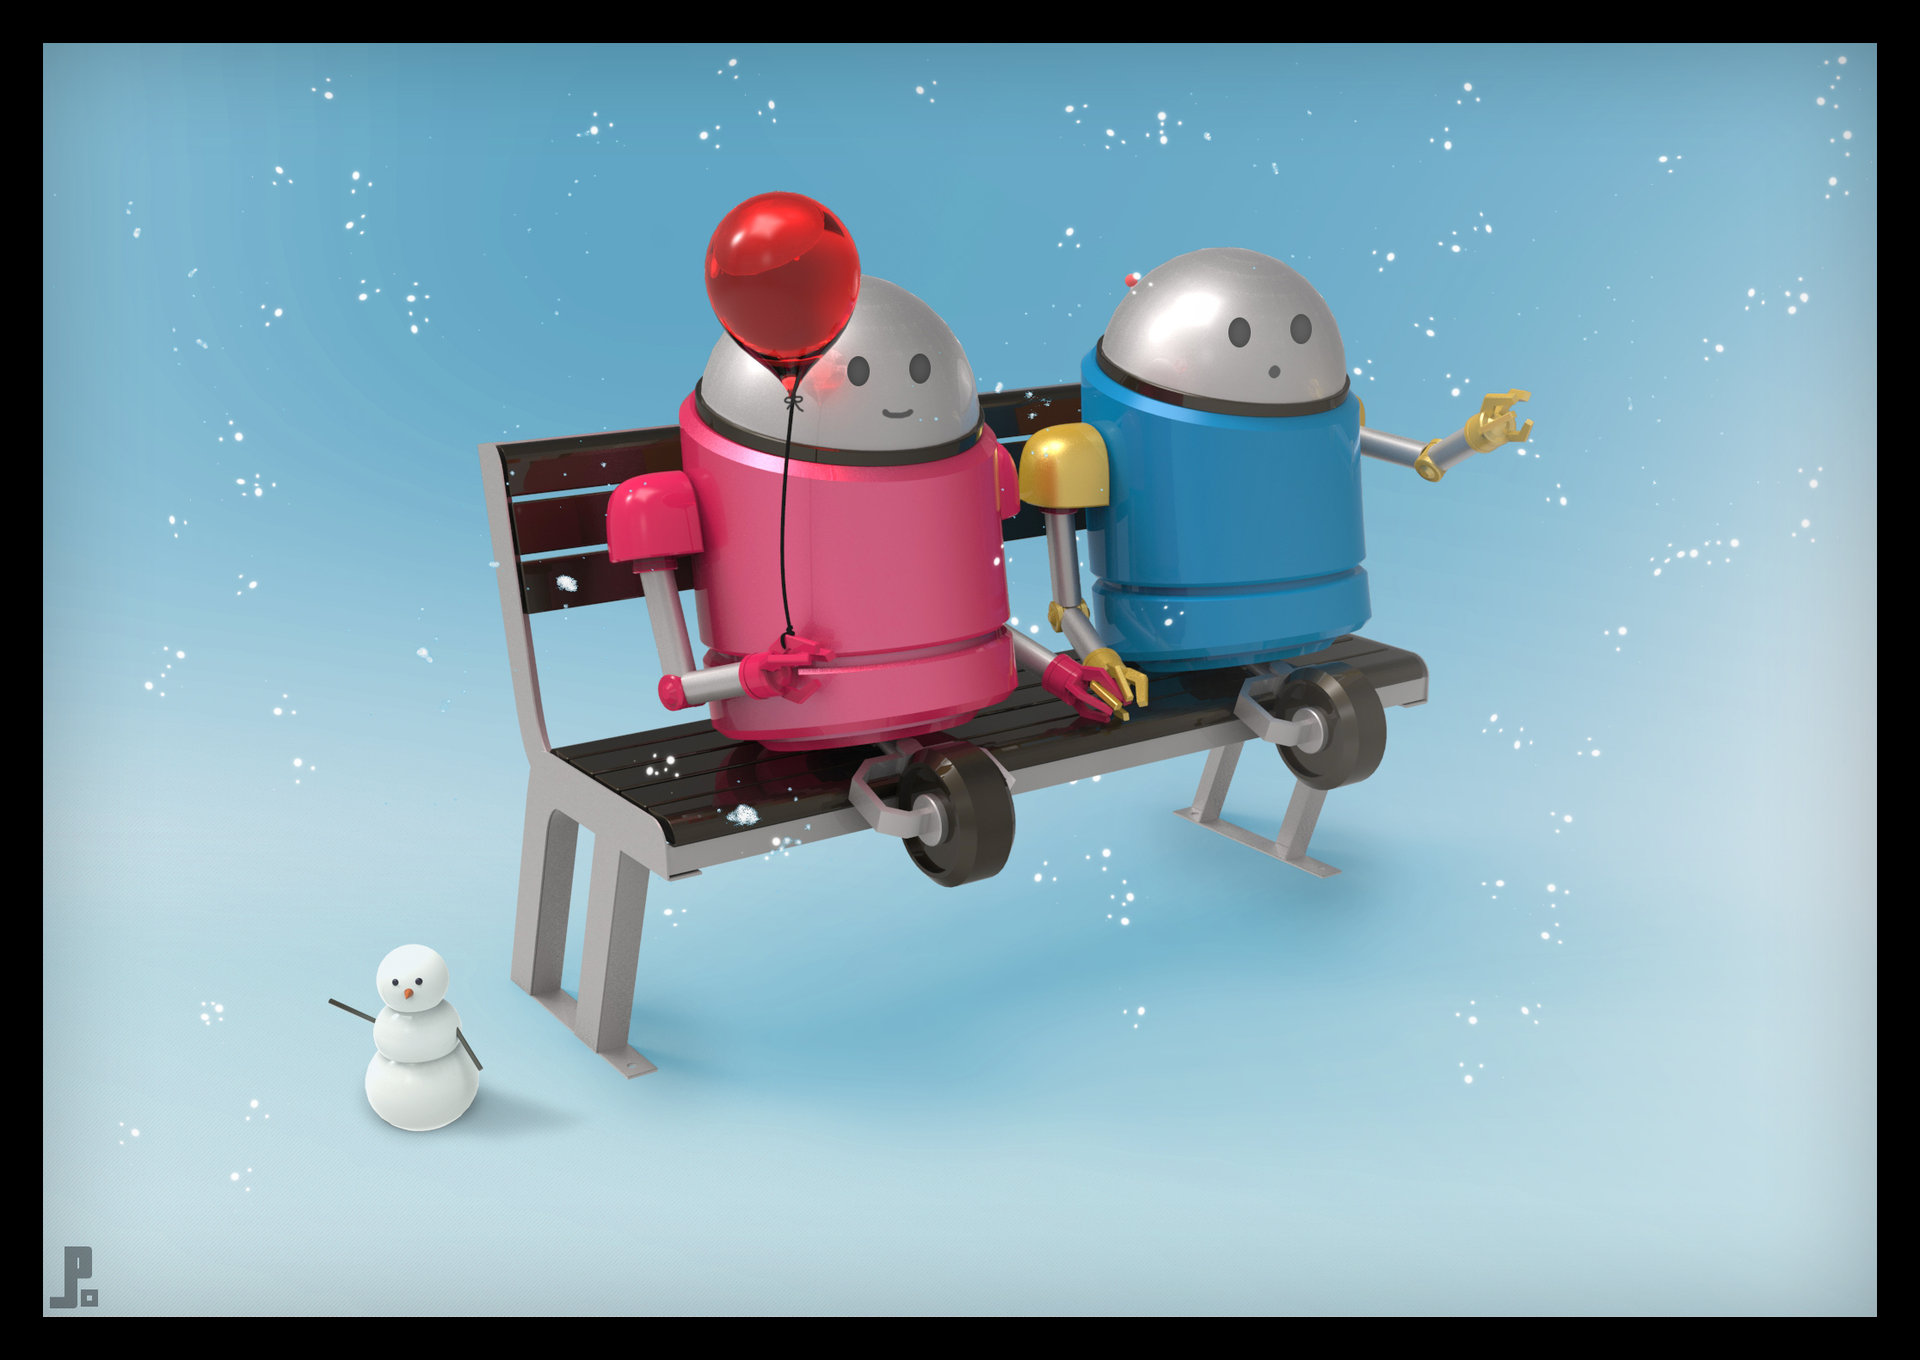 Minibots bench